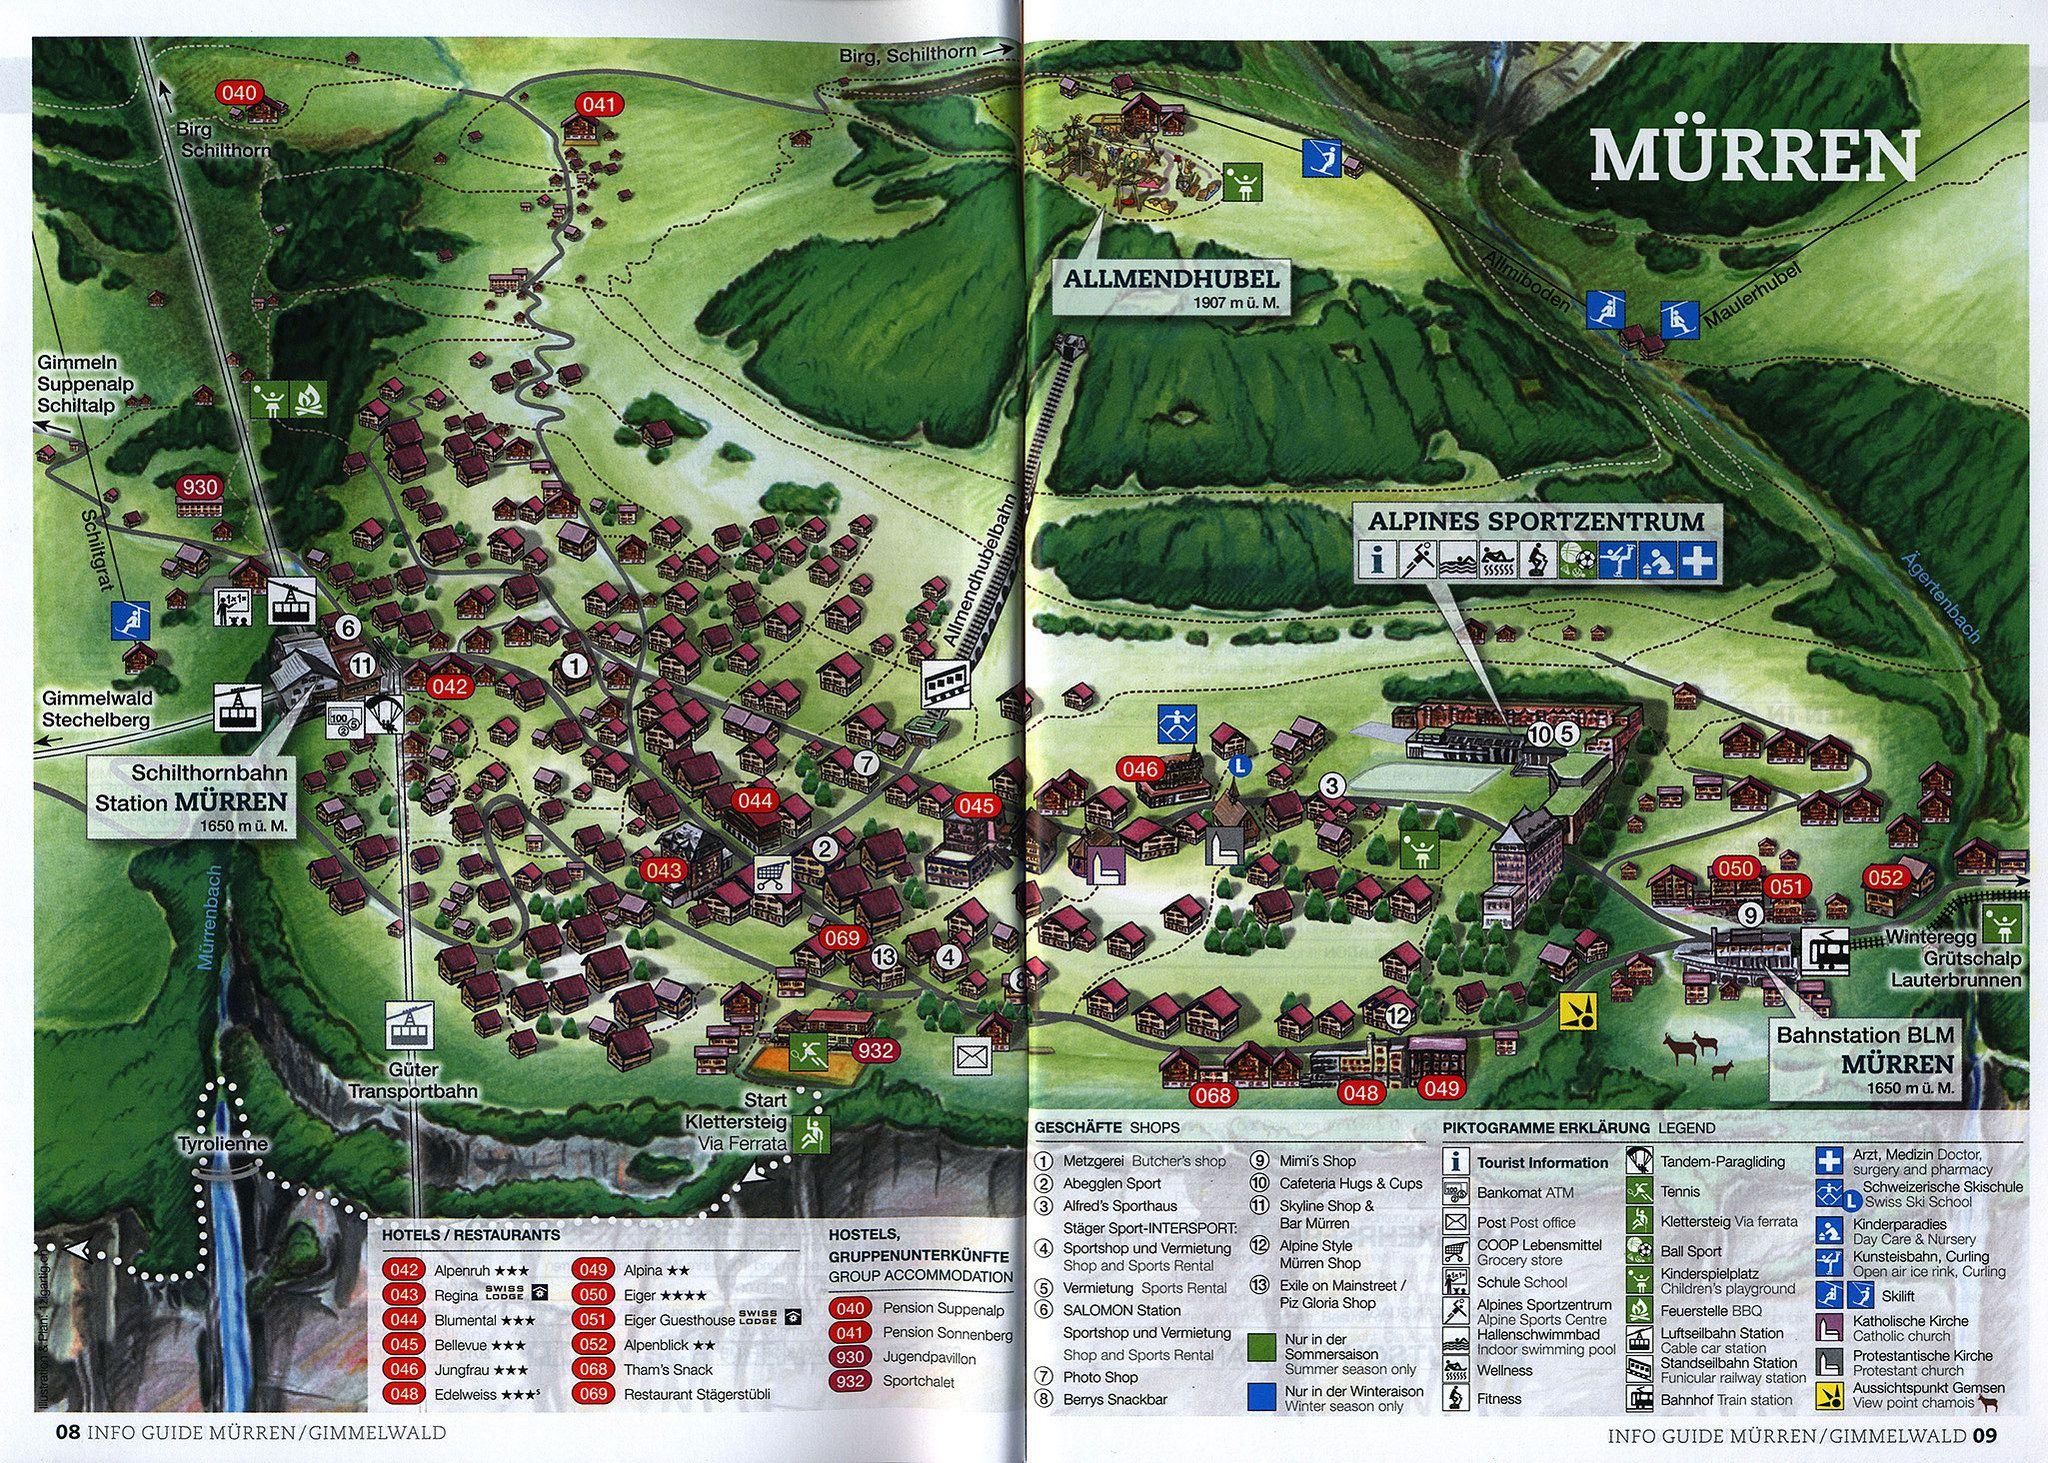 Lauterbrunnen Gimmelwald Mrren Info Guide Sommer Summer 20162